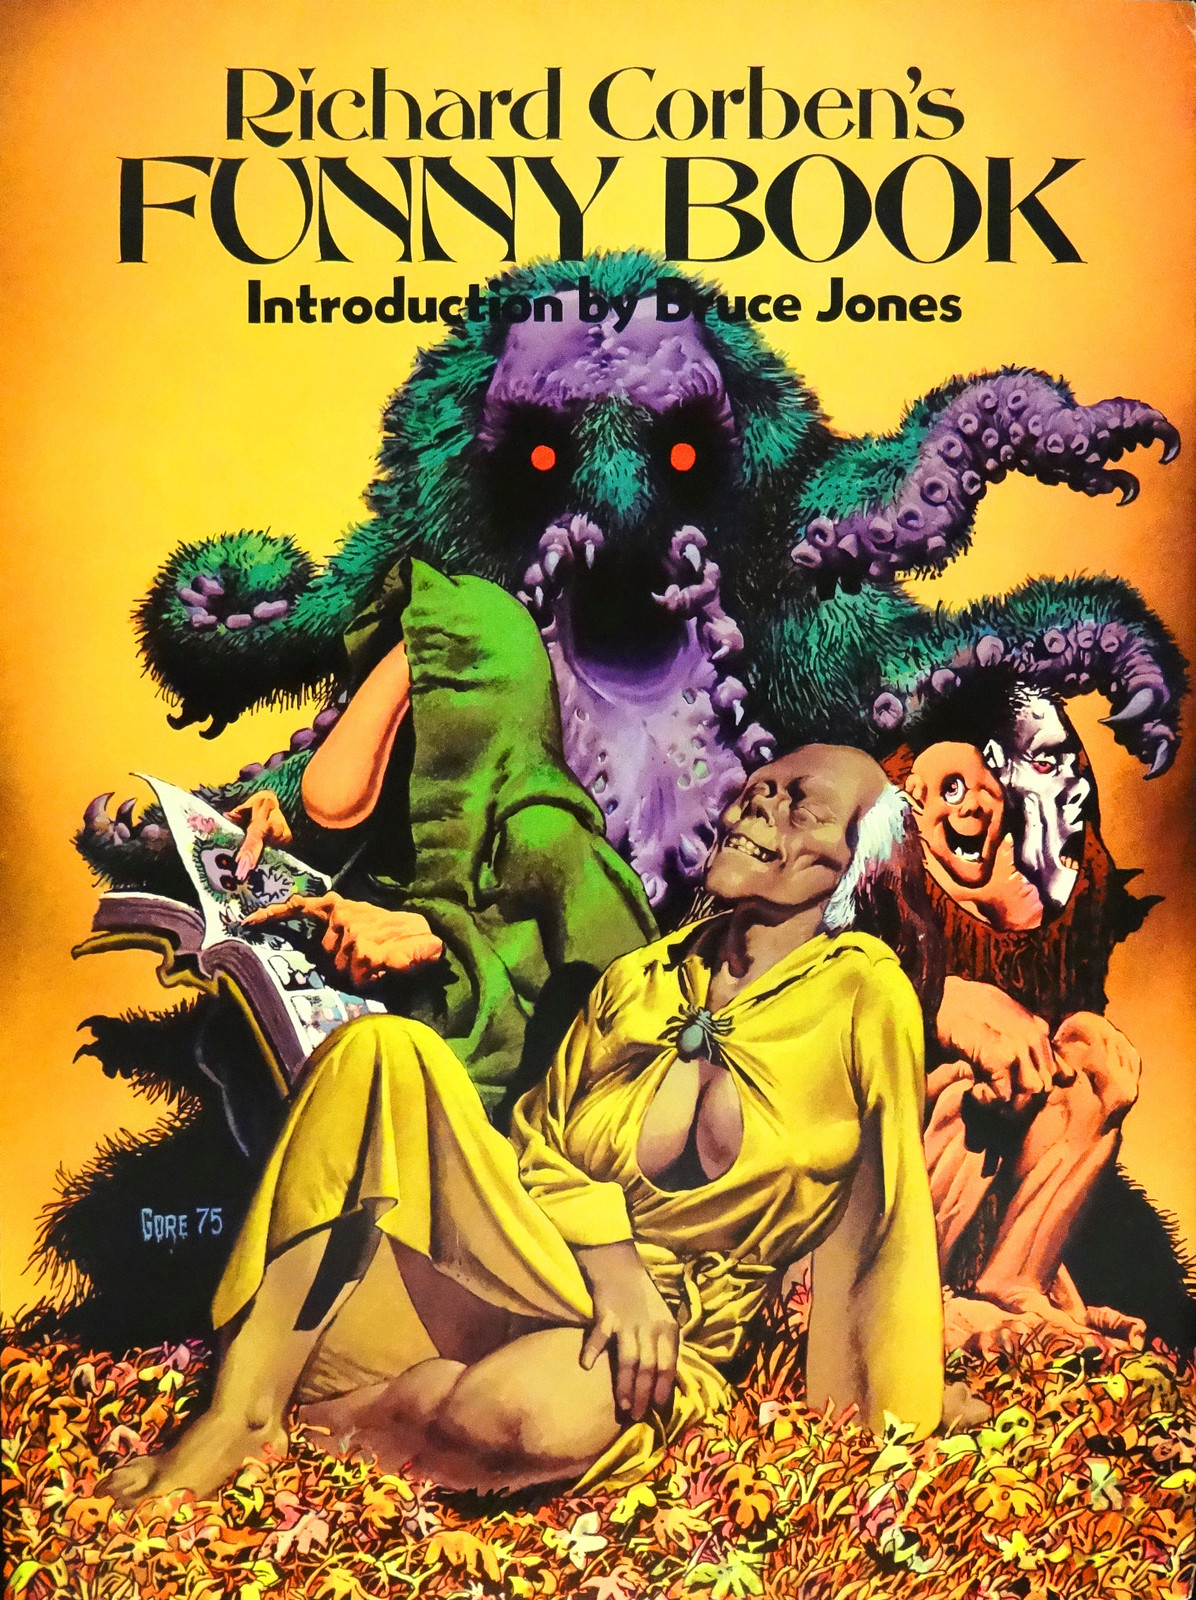 """Richard Corben's Funny Book."" Kansas City: Nickelodeon Press, 1976."